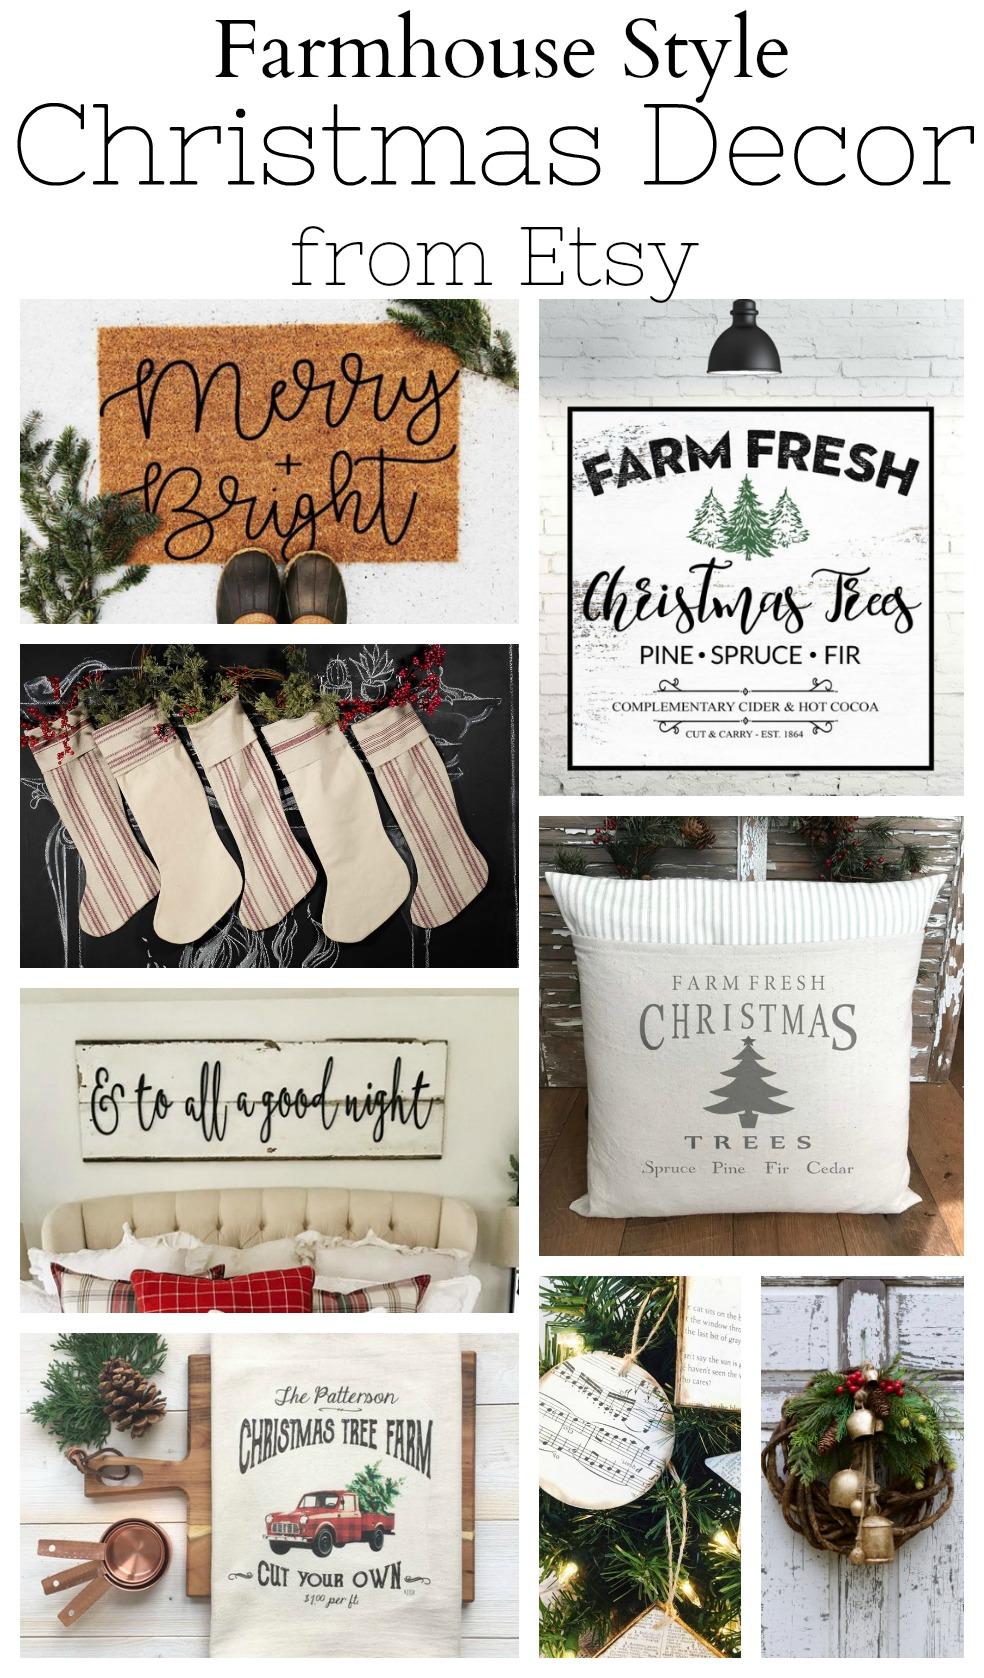 Farmhouse Style Christmas Decor From Etsy